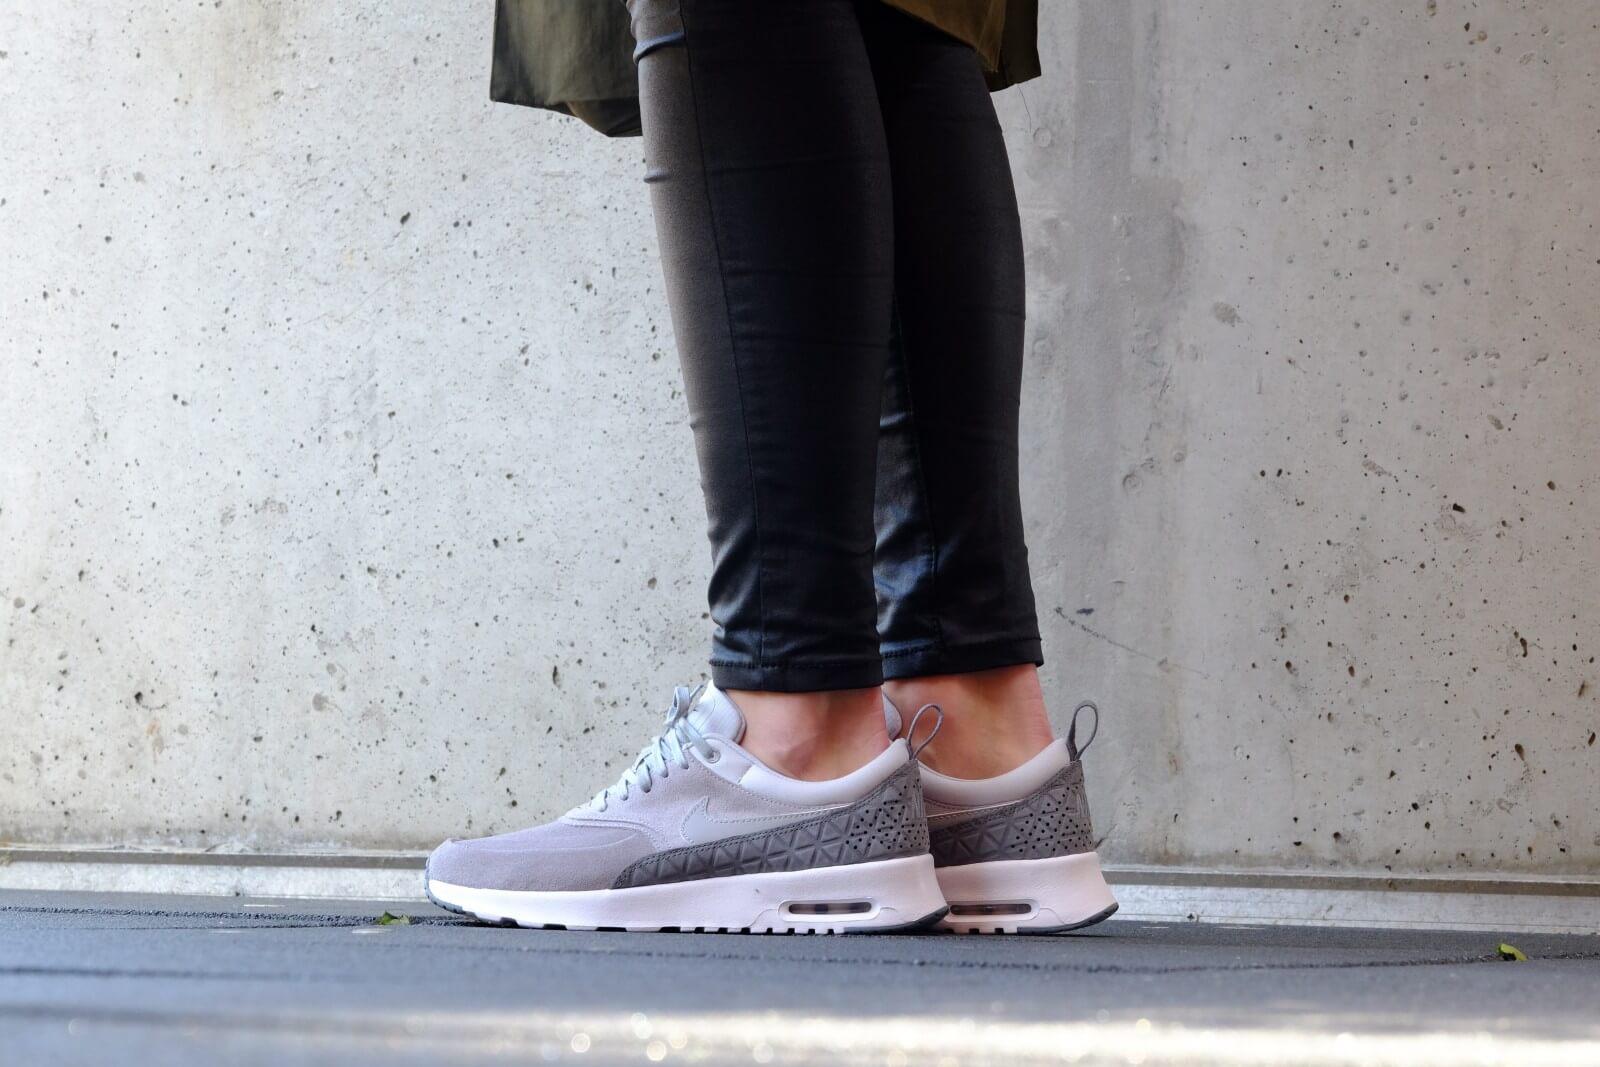 Nike WMNS Air Max Thea Premium Leather Matte Silver Pure